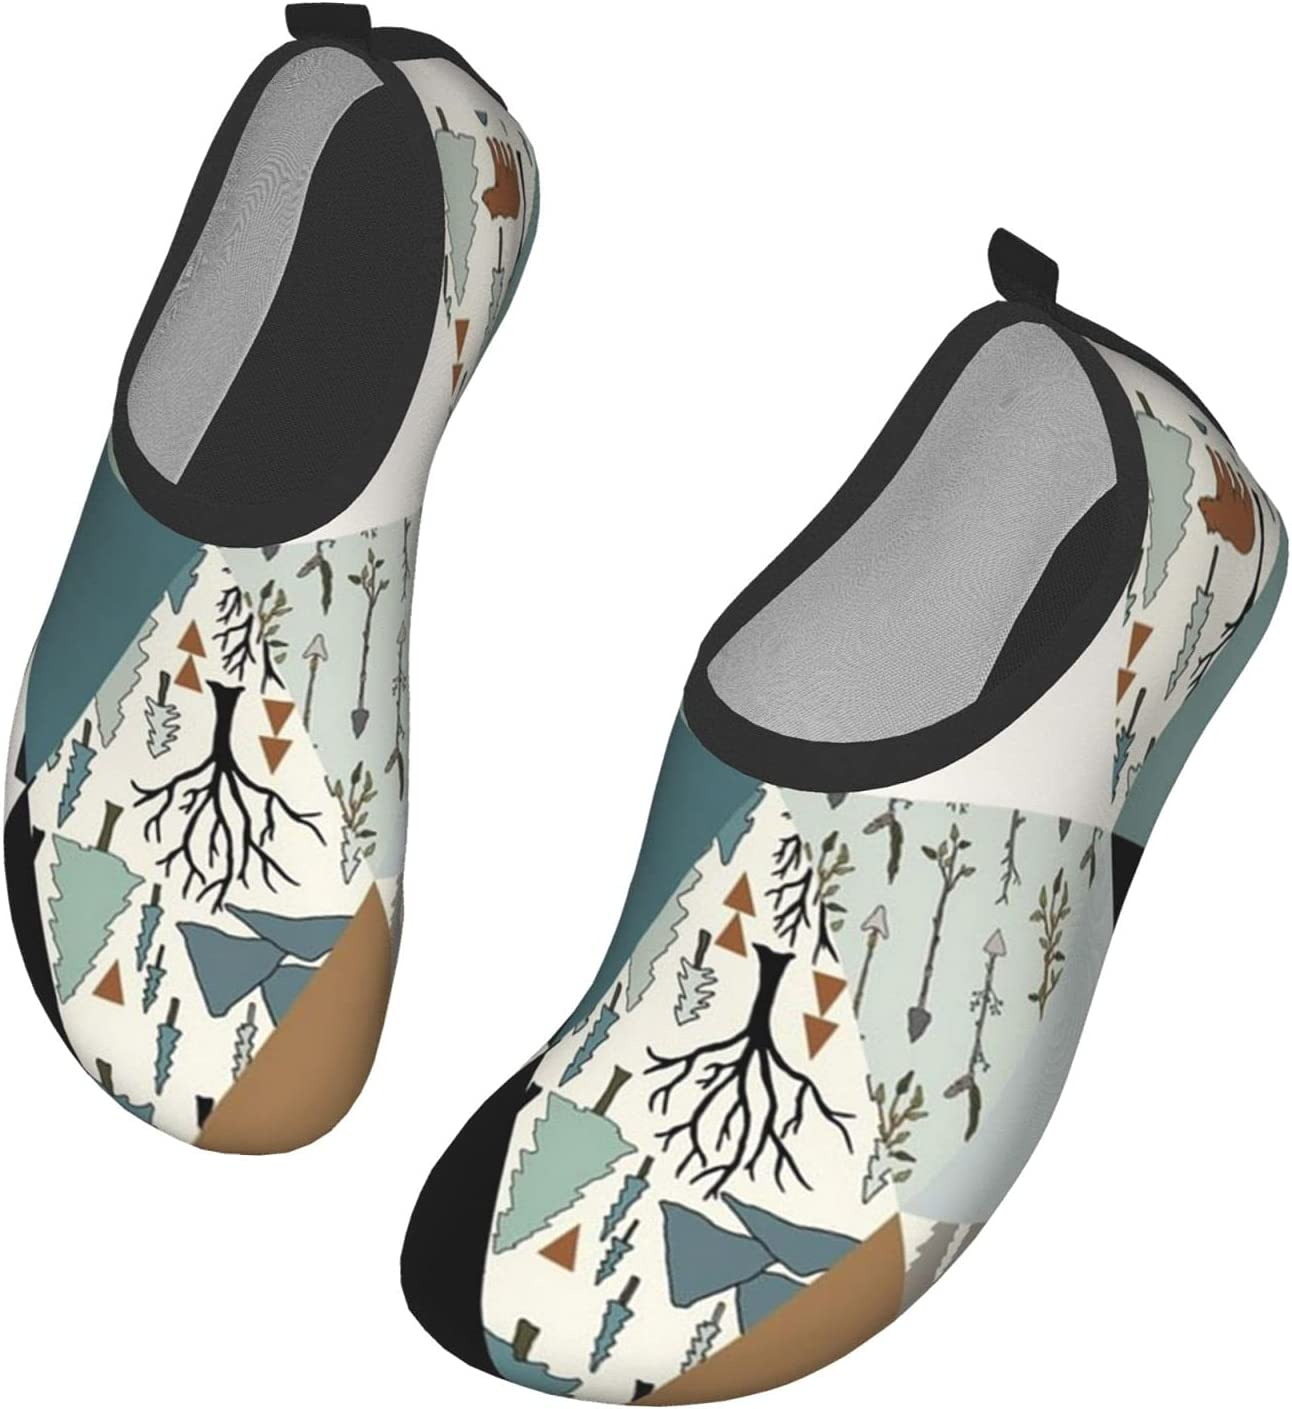 NA Bear Forest Triangle Pattern Men's Women's Water Shoes Barefoot Quick Dry Slip-On Aqua Socks for Yoga Beach Sports Swim Surf